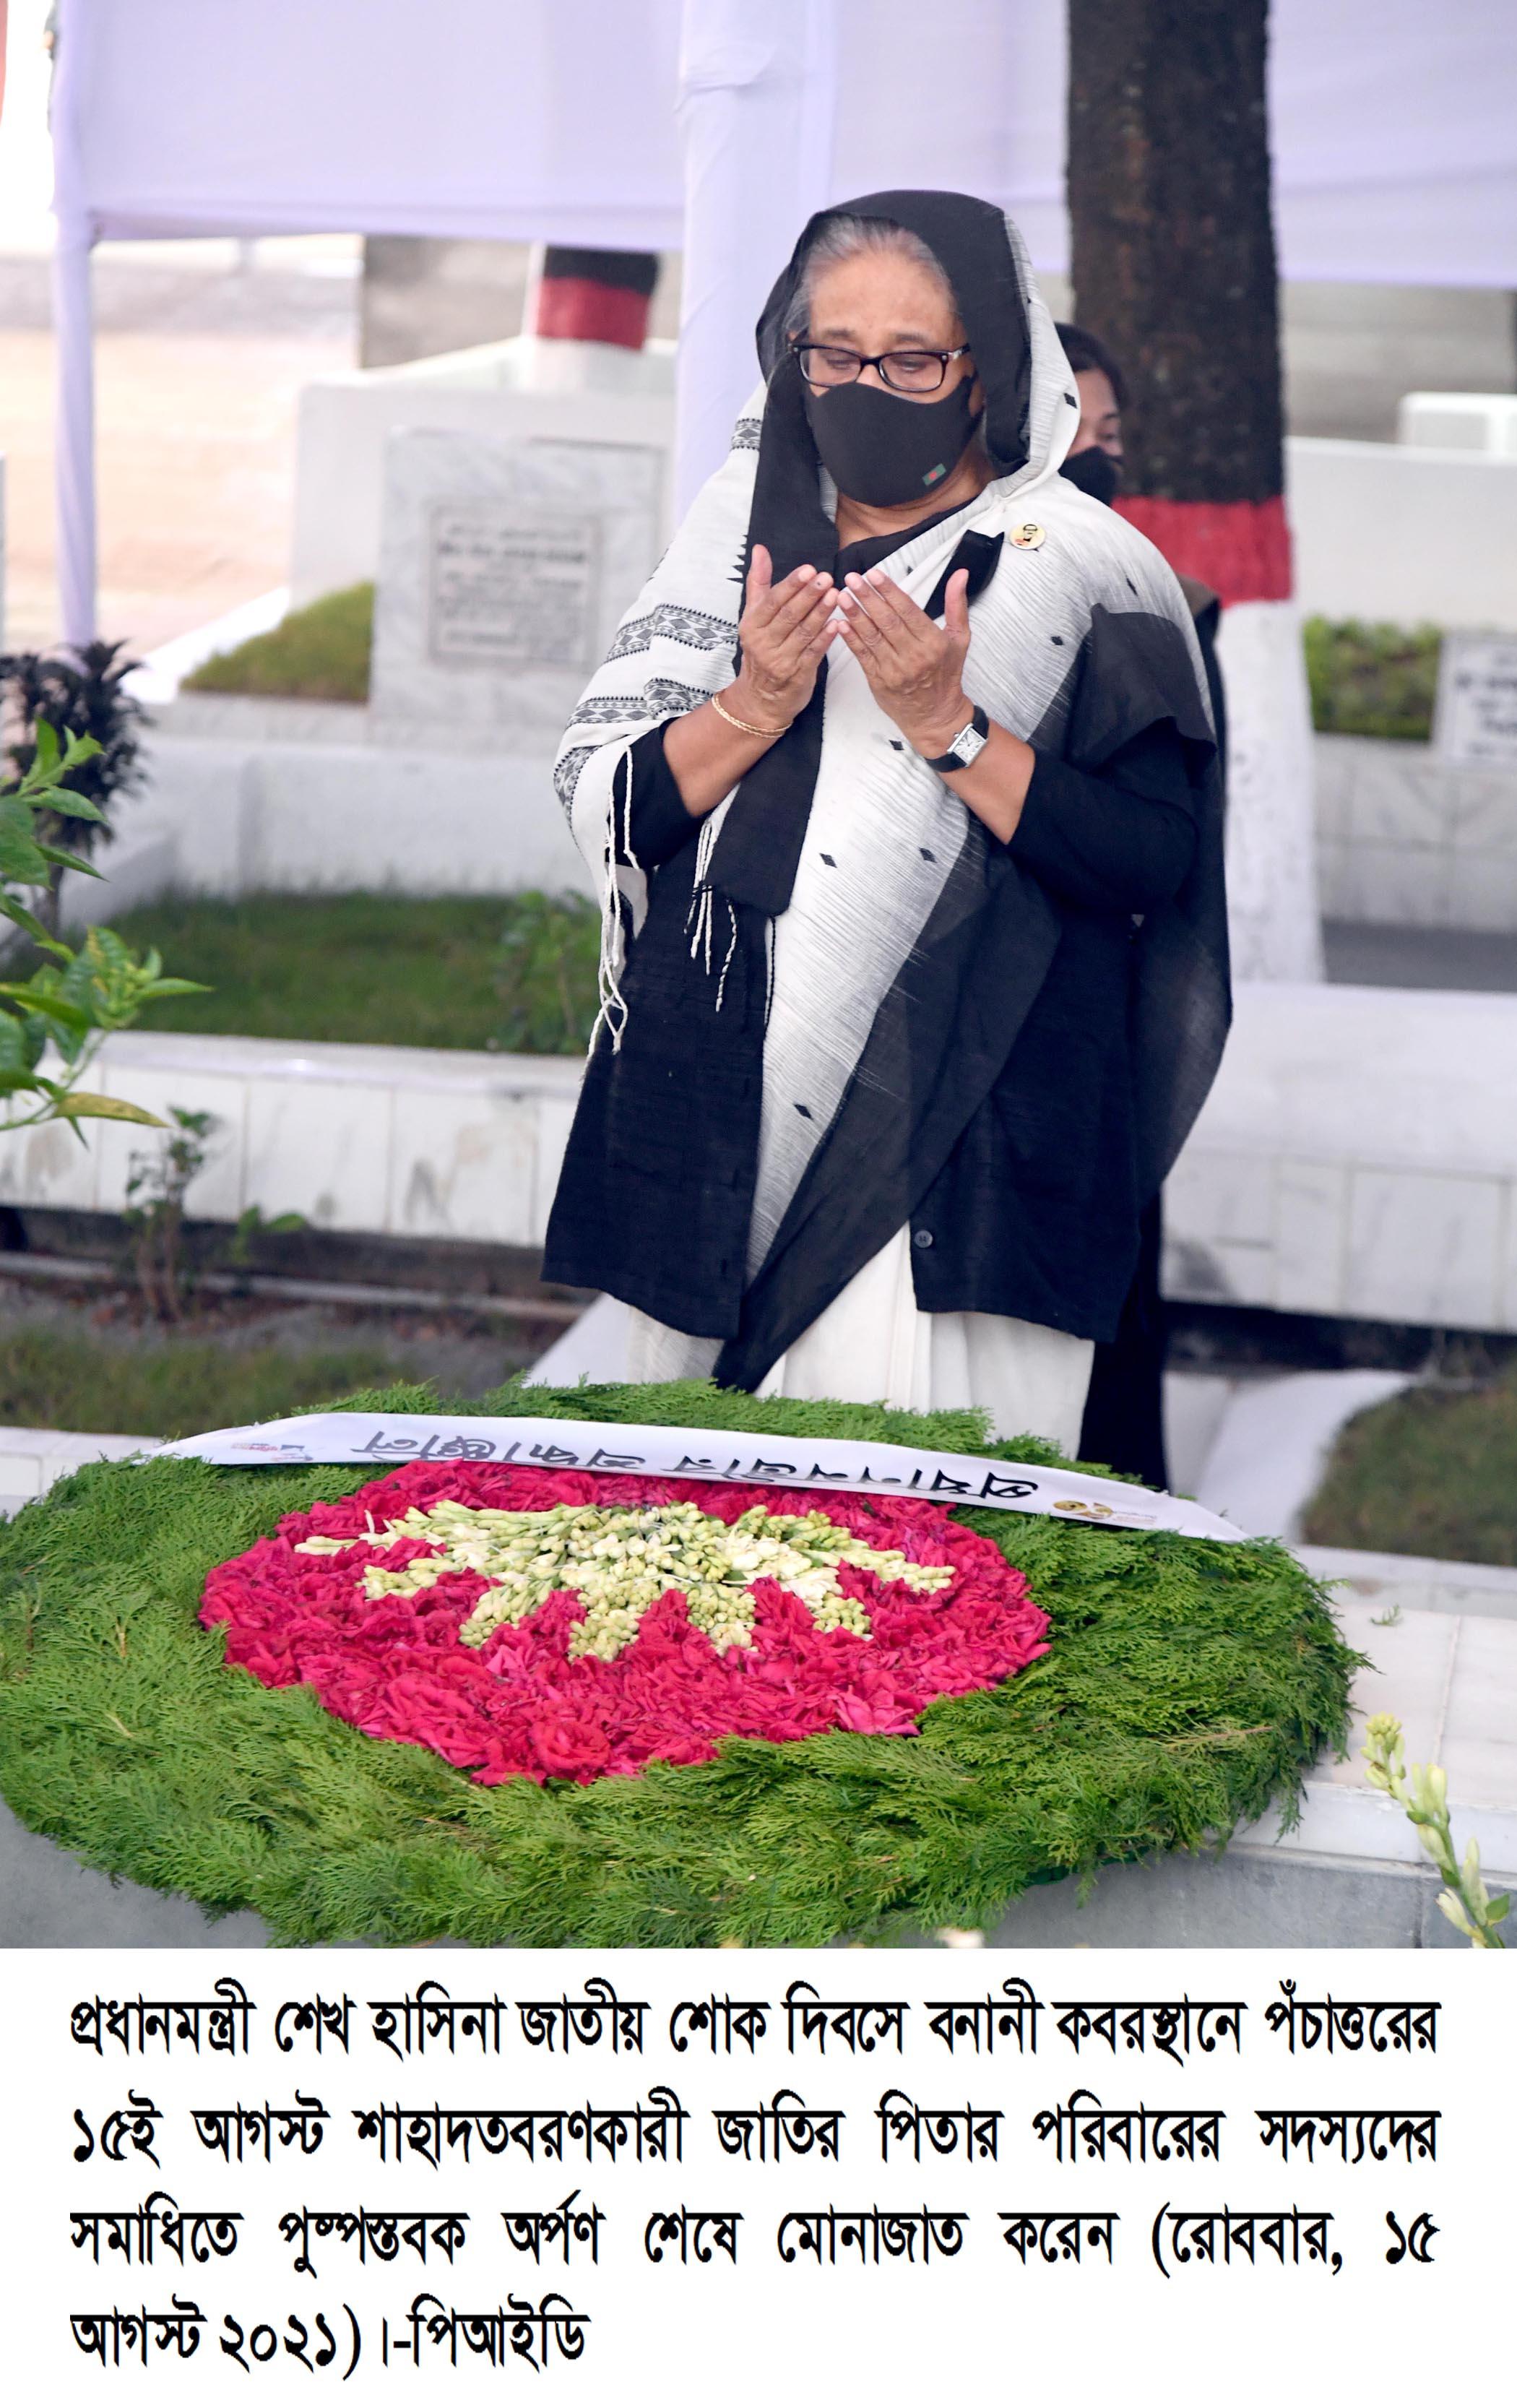 Bangladesh observes National Mourning Day